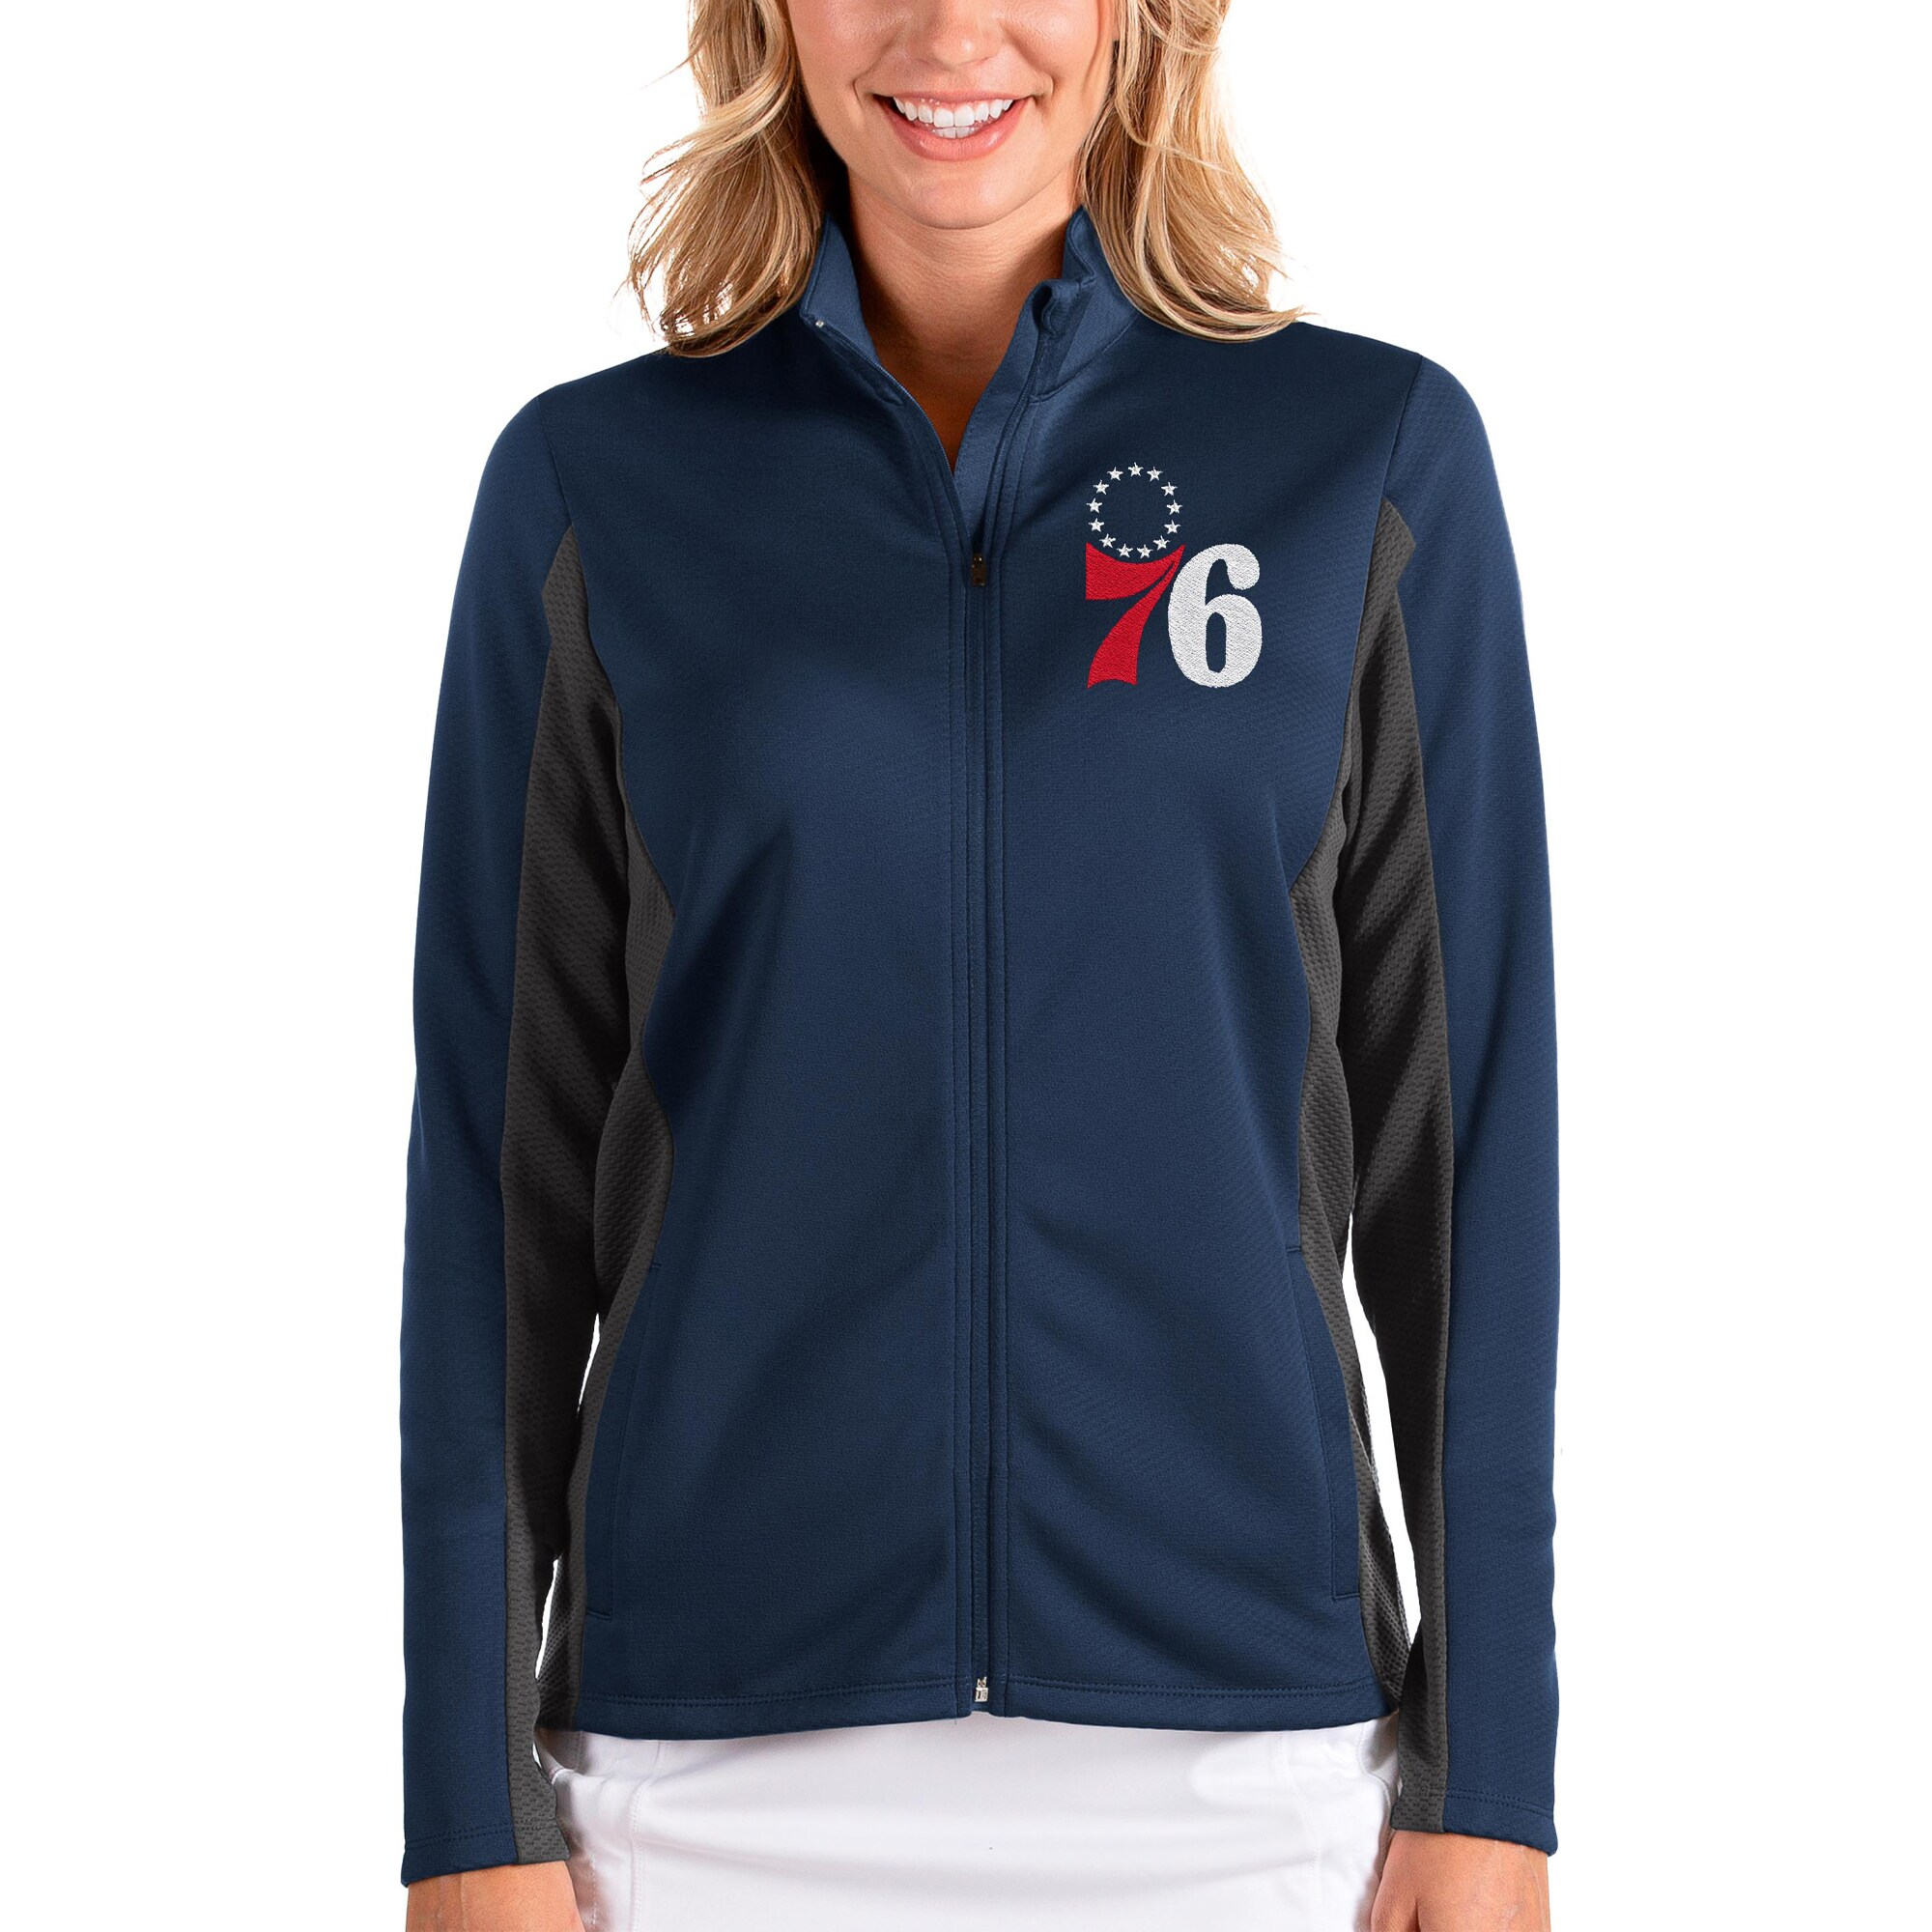 Philadelphia 76ers Antigua Women's Passage Full-Zip Jacket - Navy/Charcoal